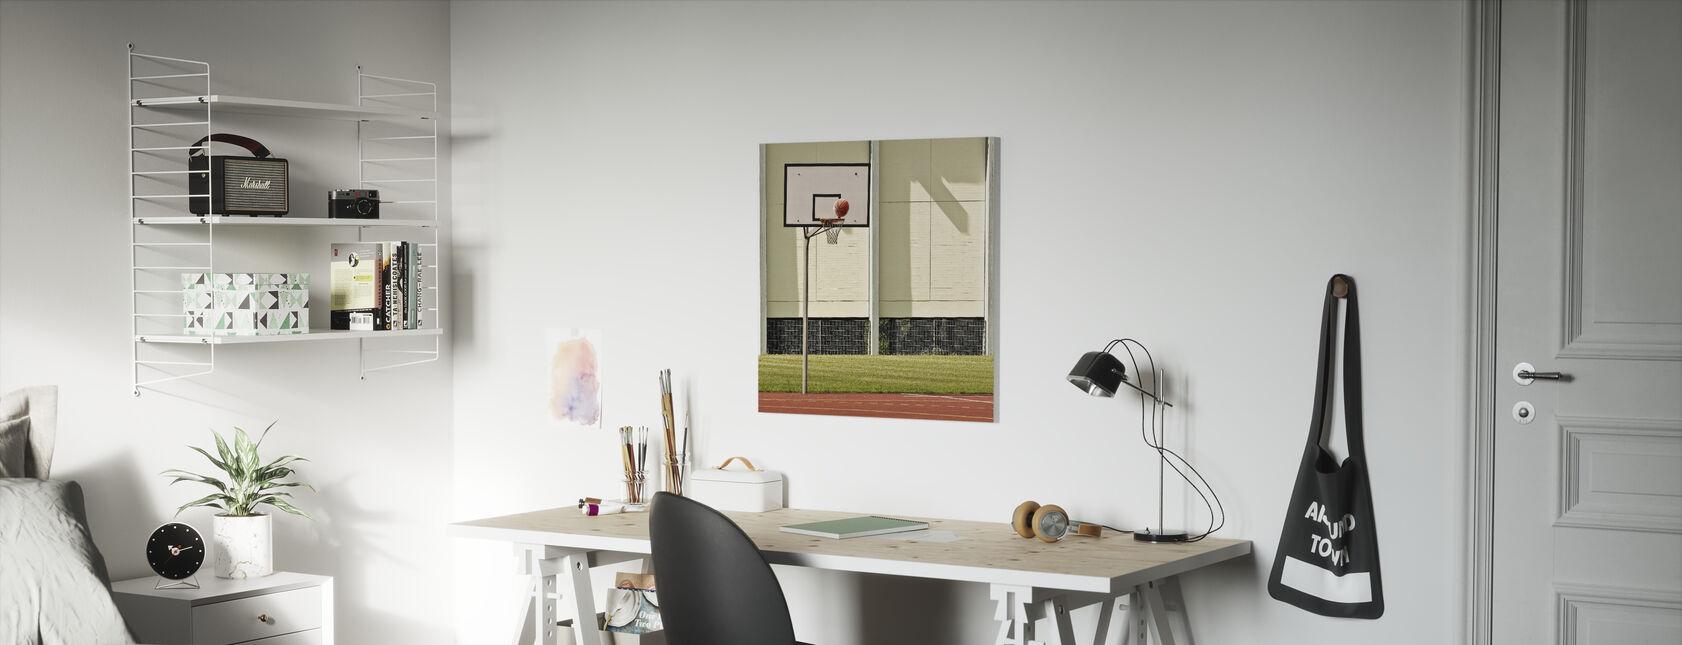 Doelpunt - Canvas print - Kinderkamer